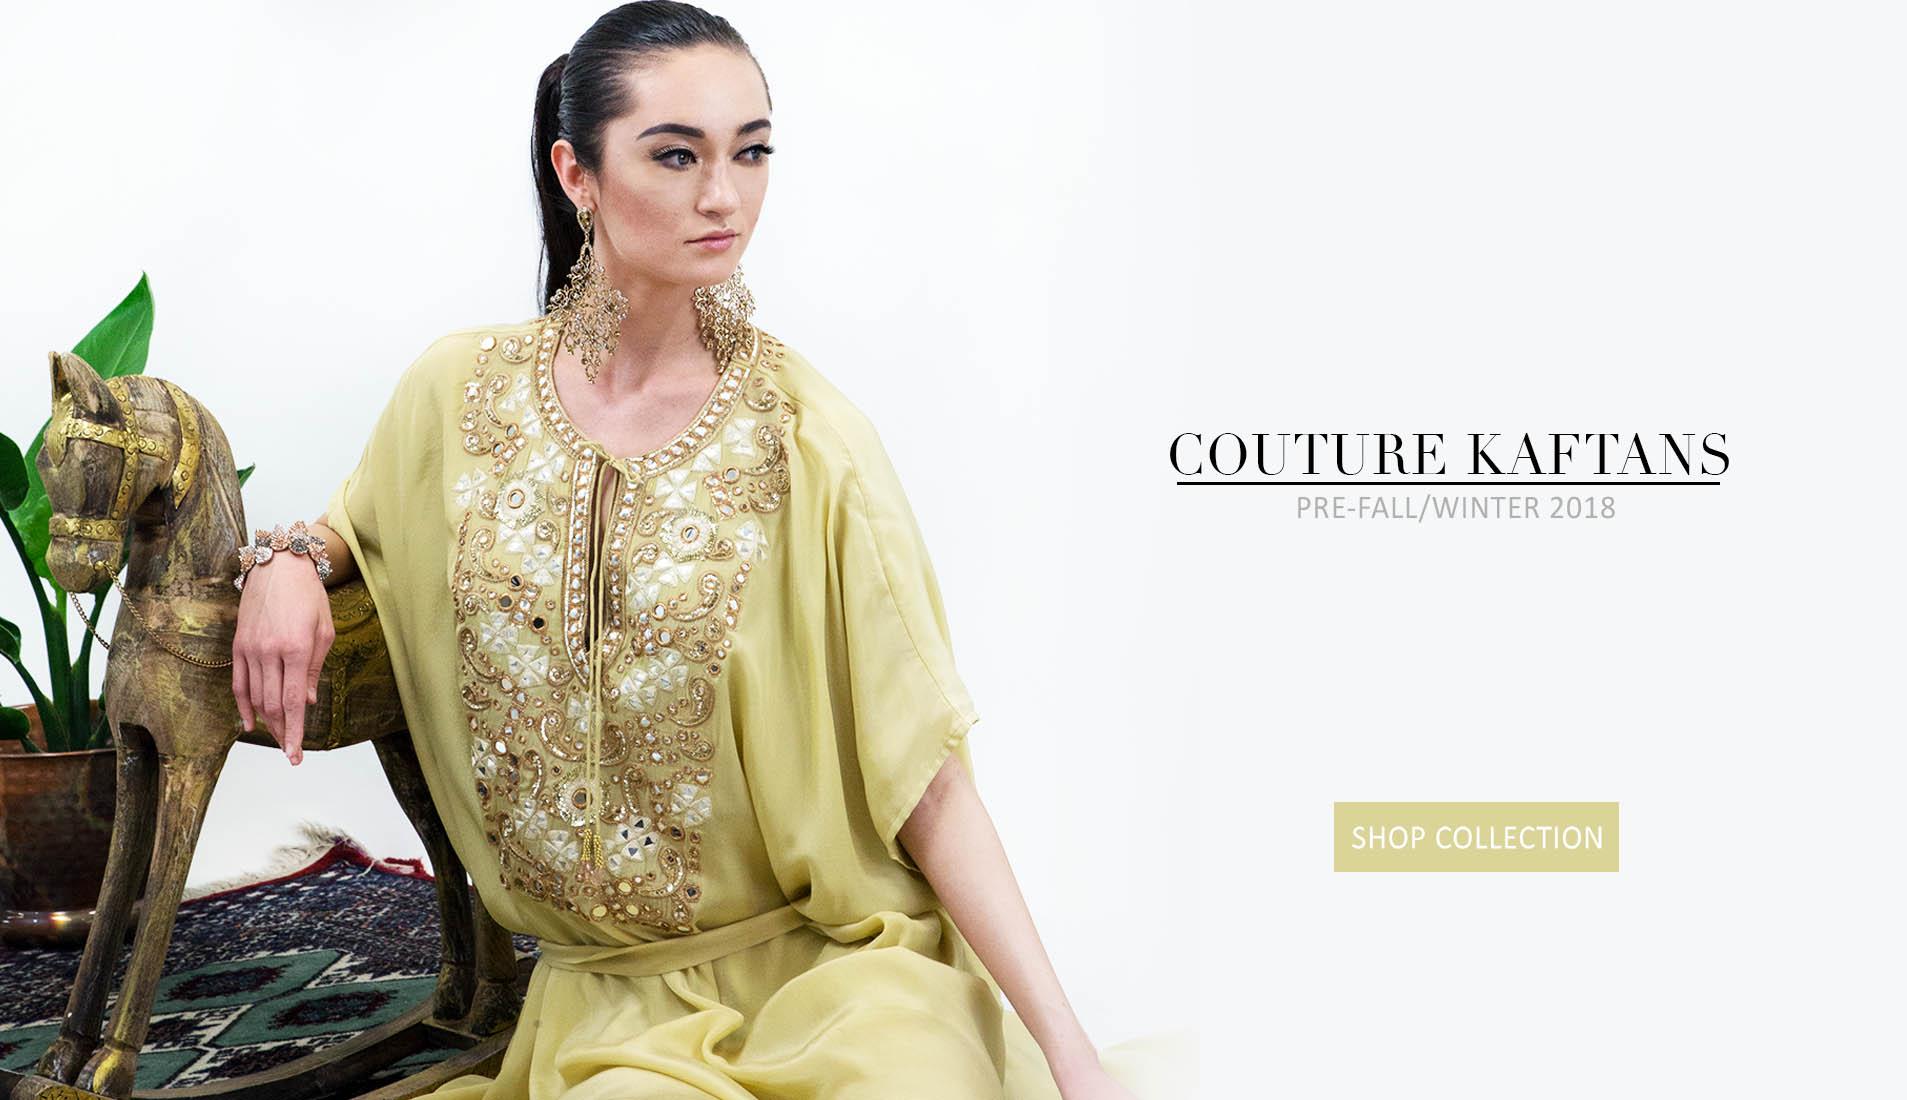 couture caftan dresses pre fall winter 2018